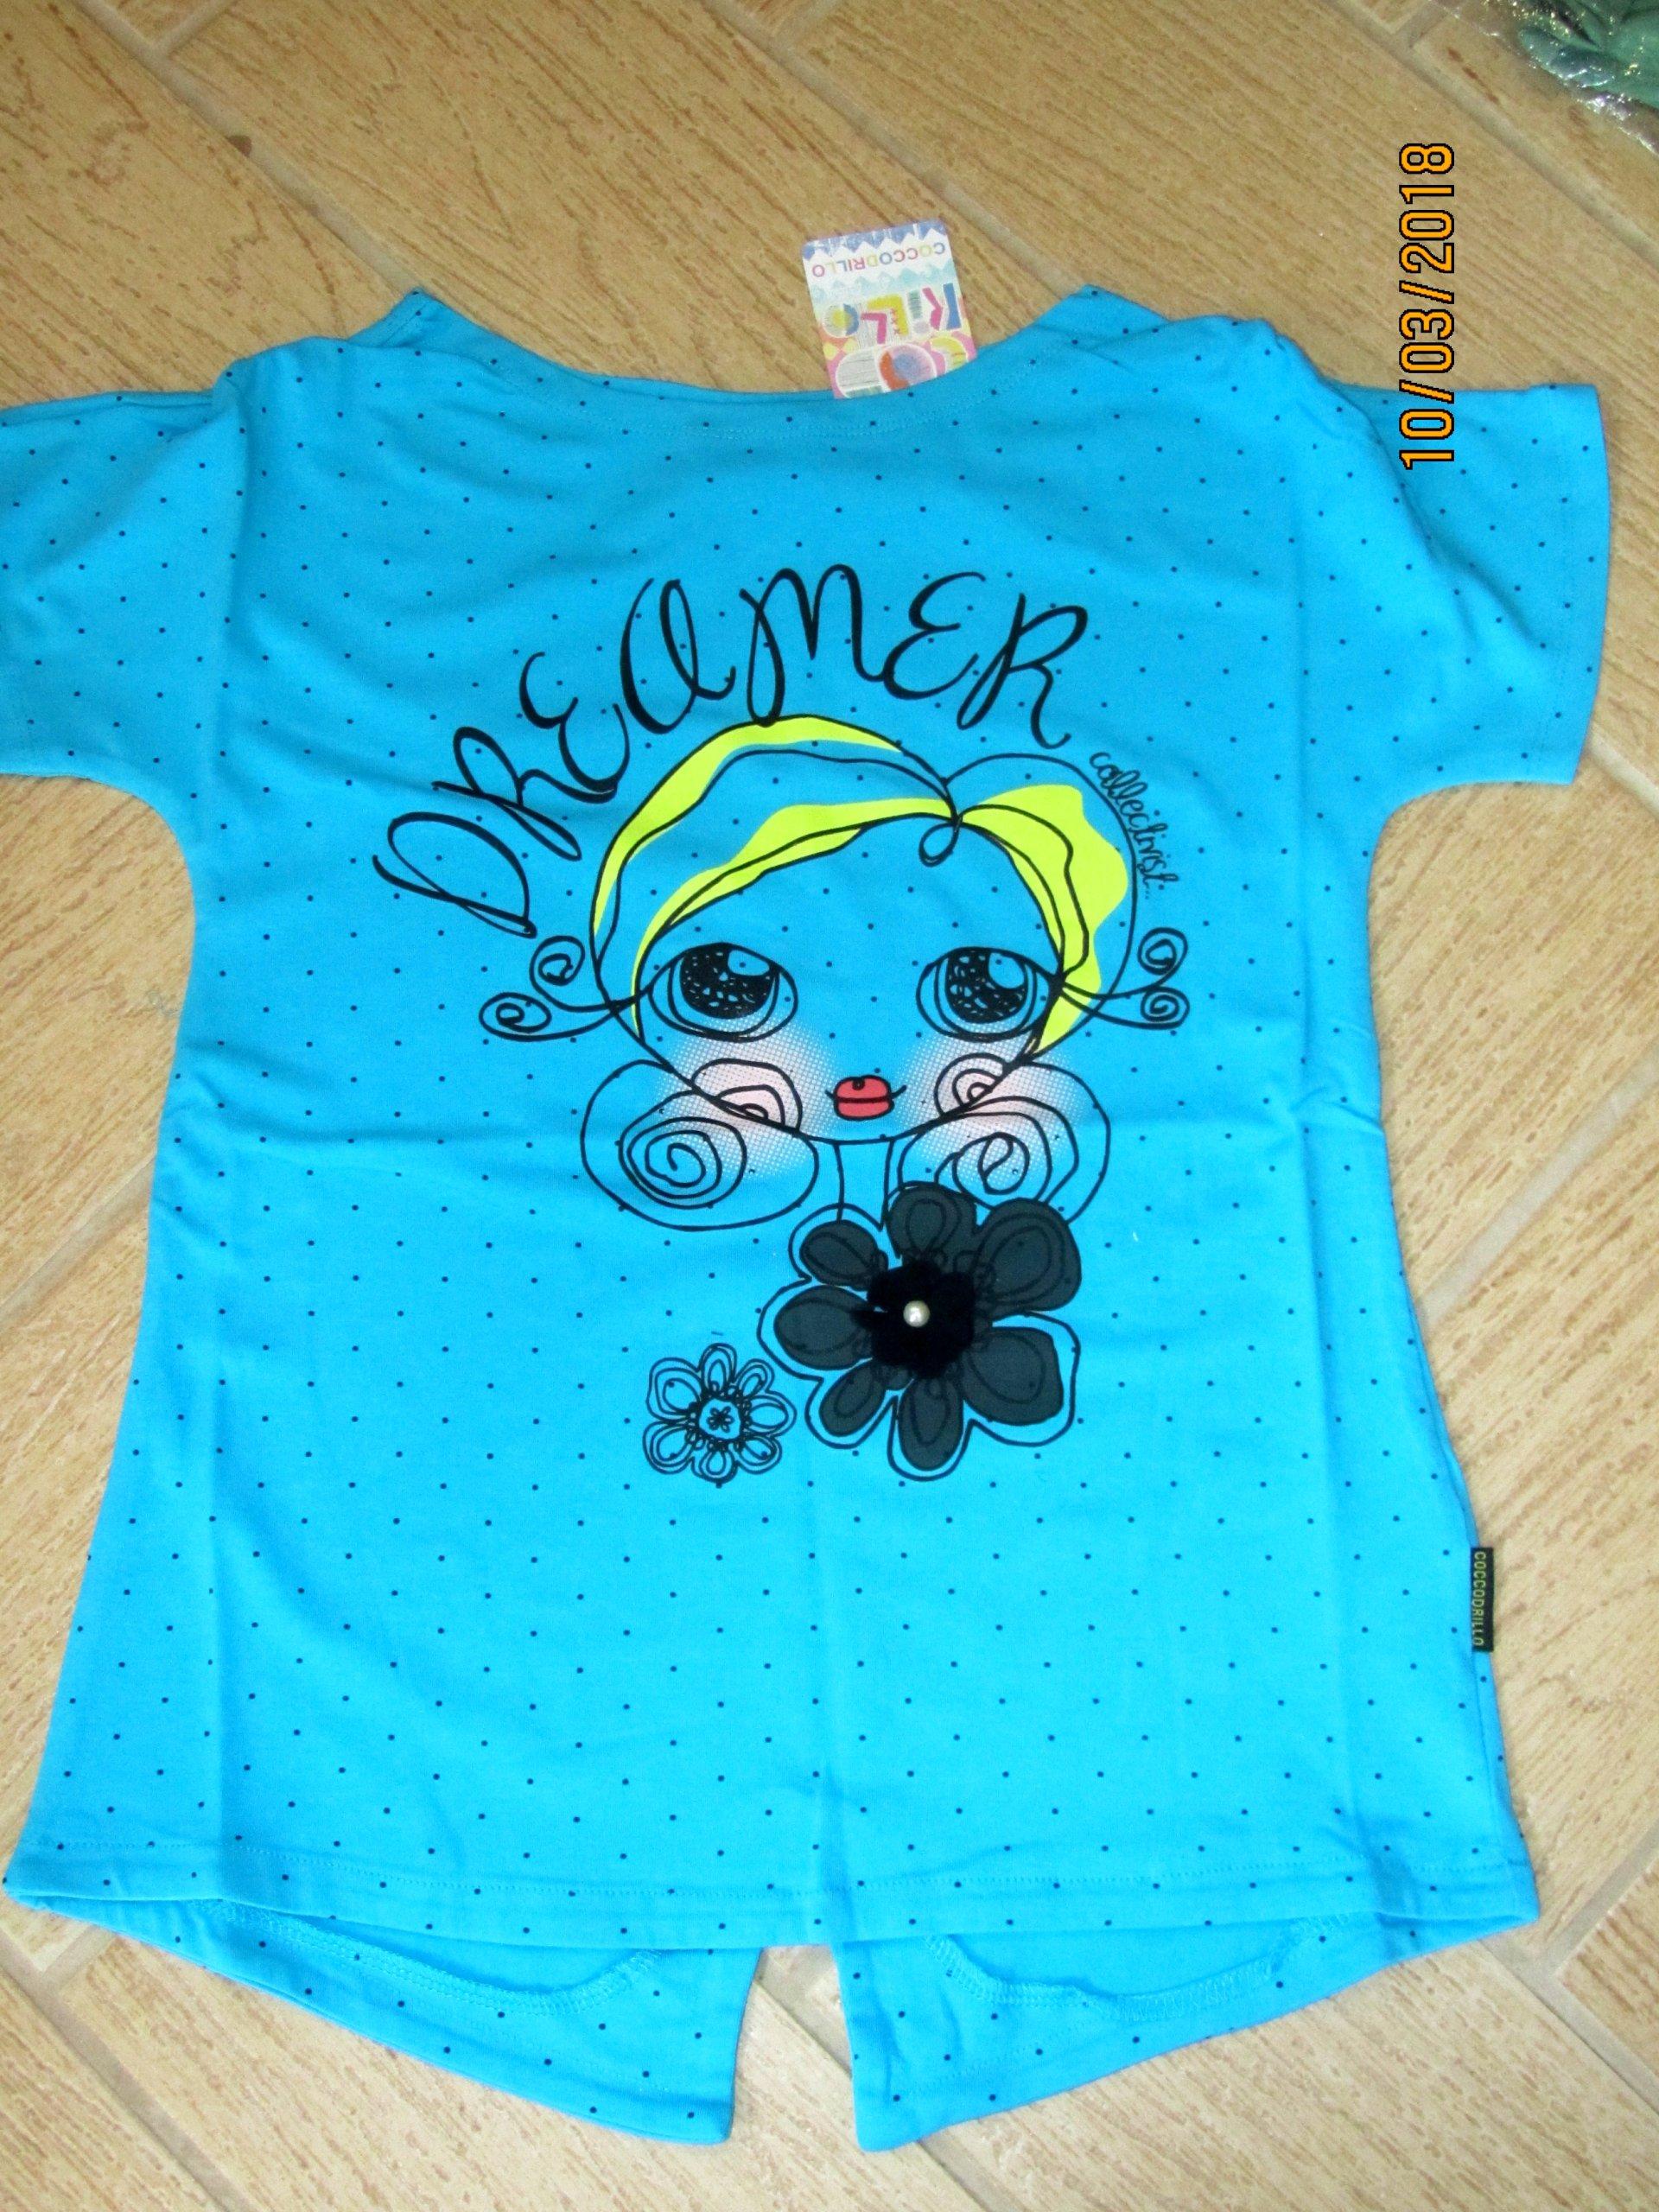 NOWY t-shirt turkusowy 152 12lat Coccodrillo